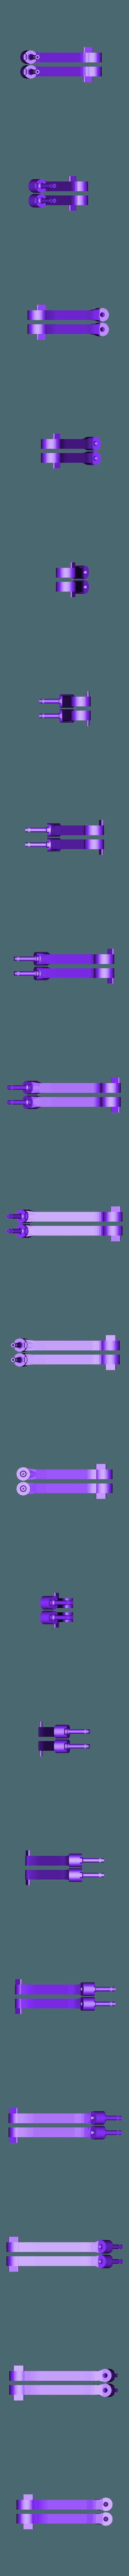 back_arm_w_screw.stl Download free STL file Foldable drone frame (Mavic look like, body & head alternative) Remix • 3D printer model, mwilmars